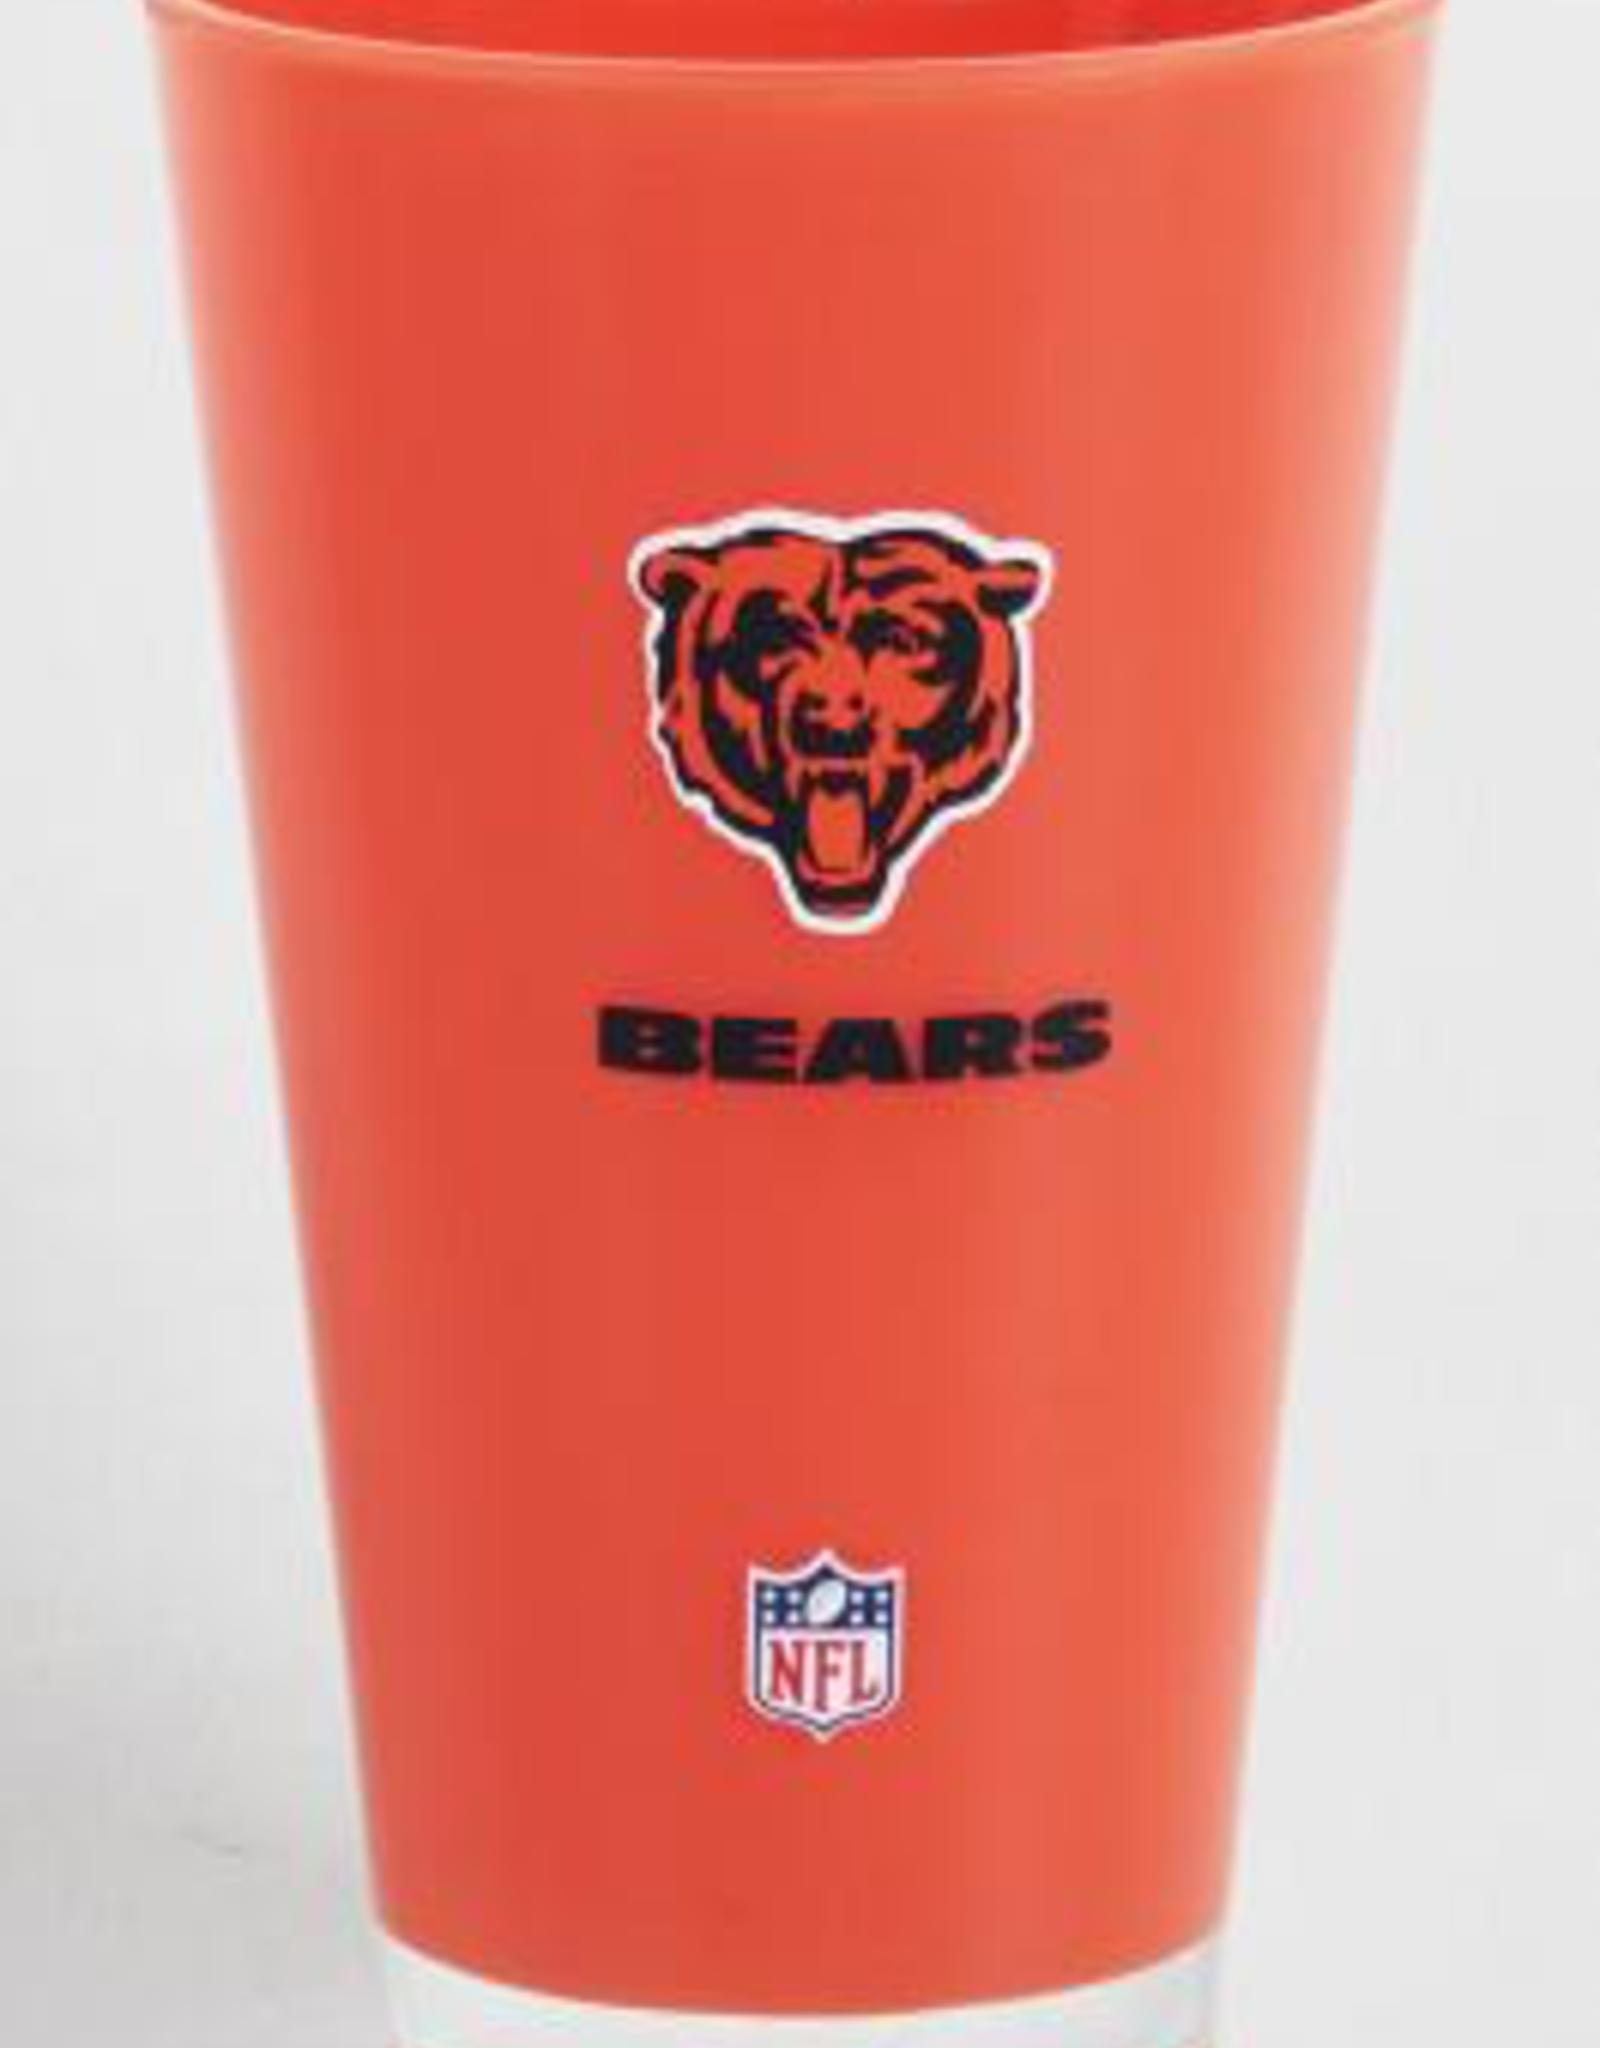 Chicago Bears Insulated 20oz Acrylic Tumbler